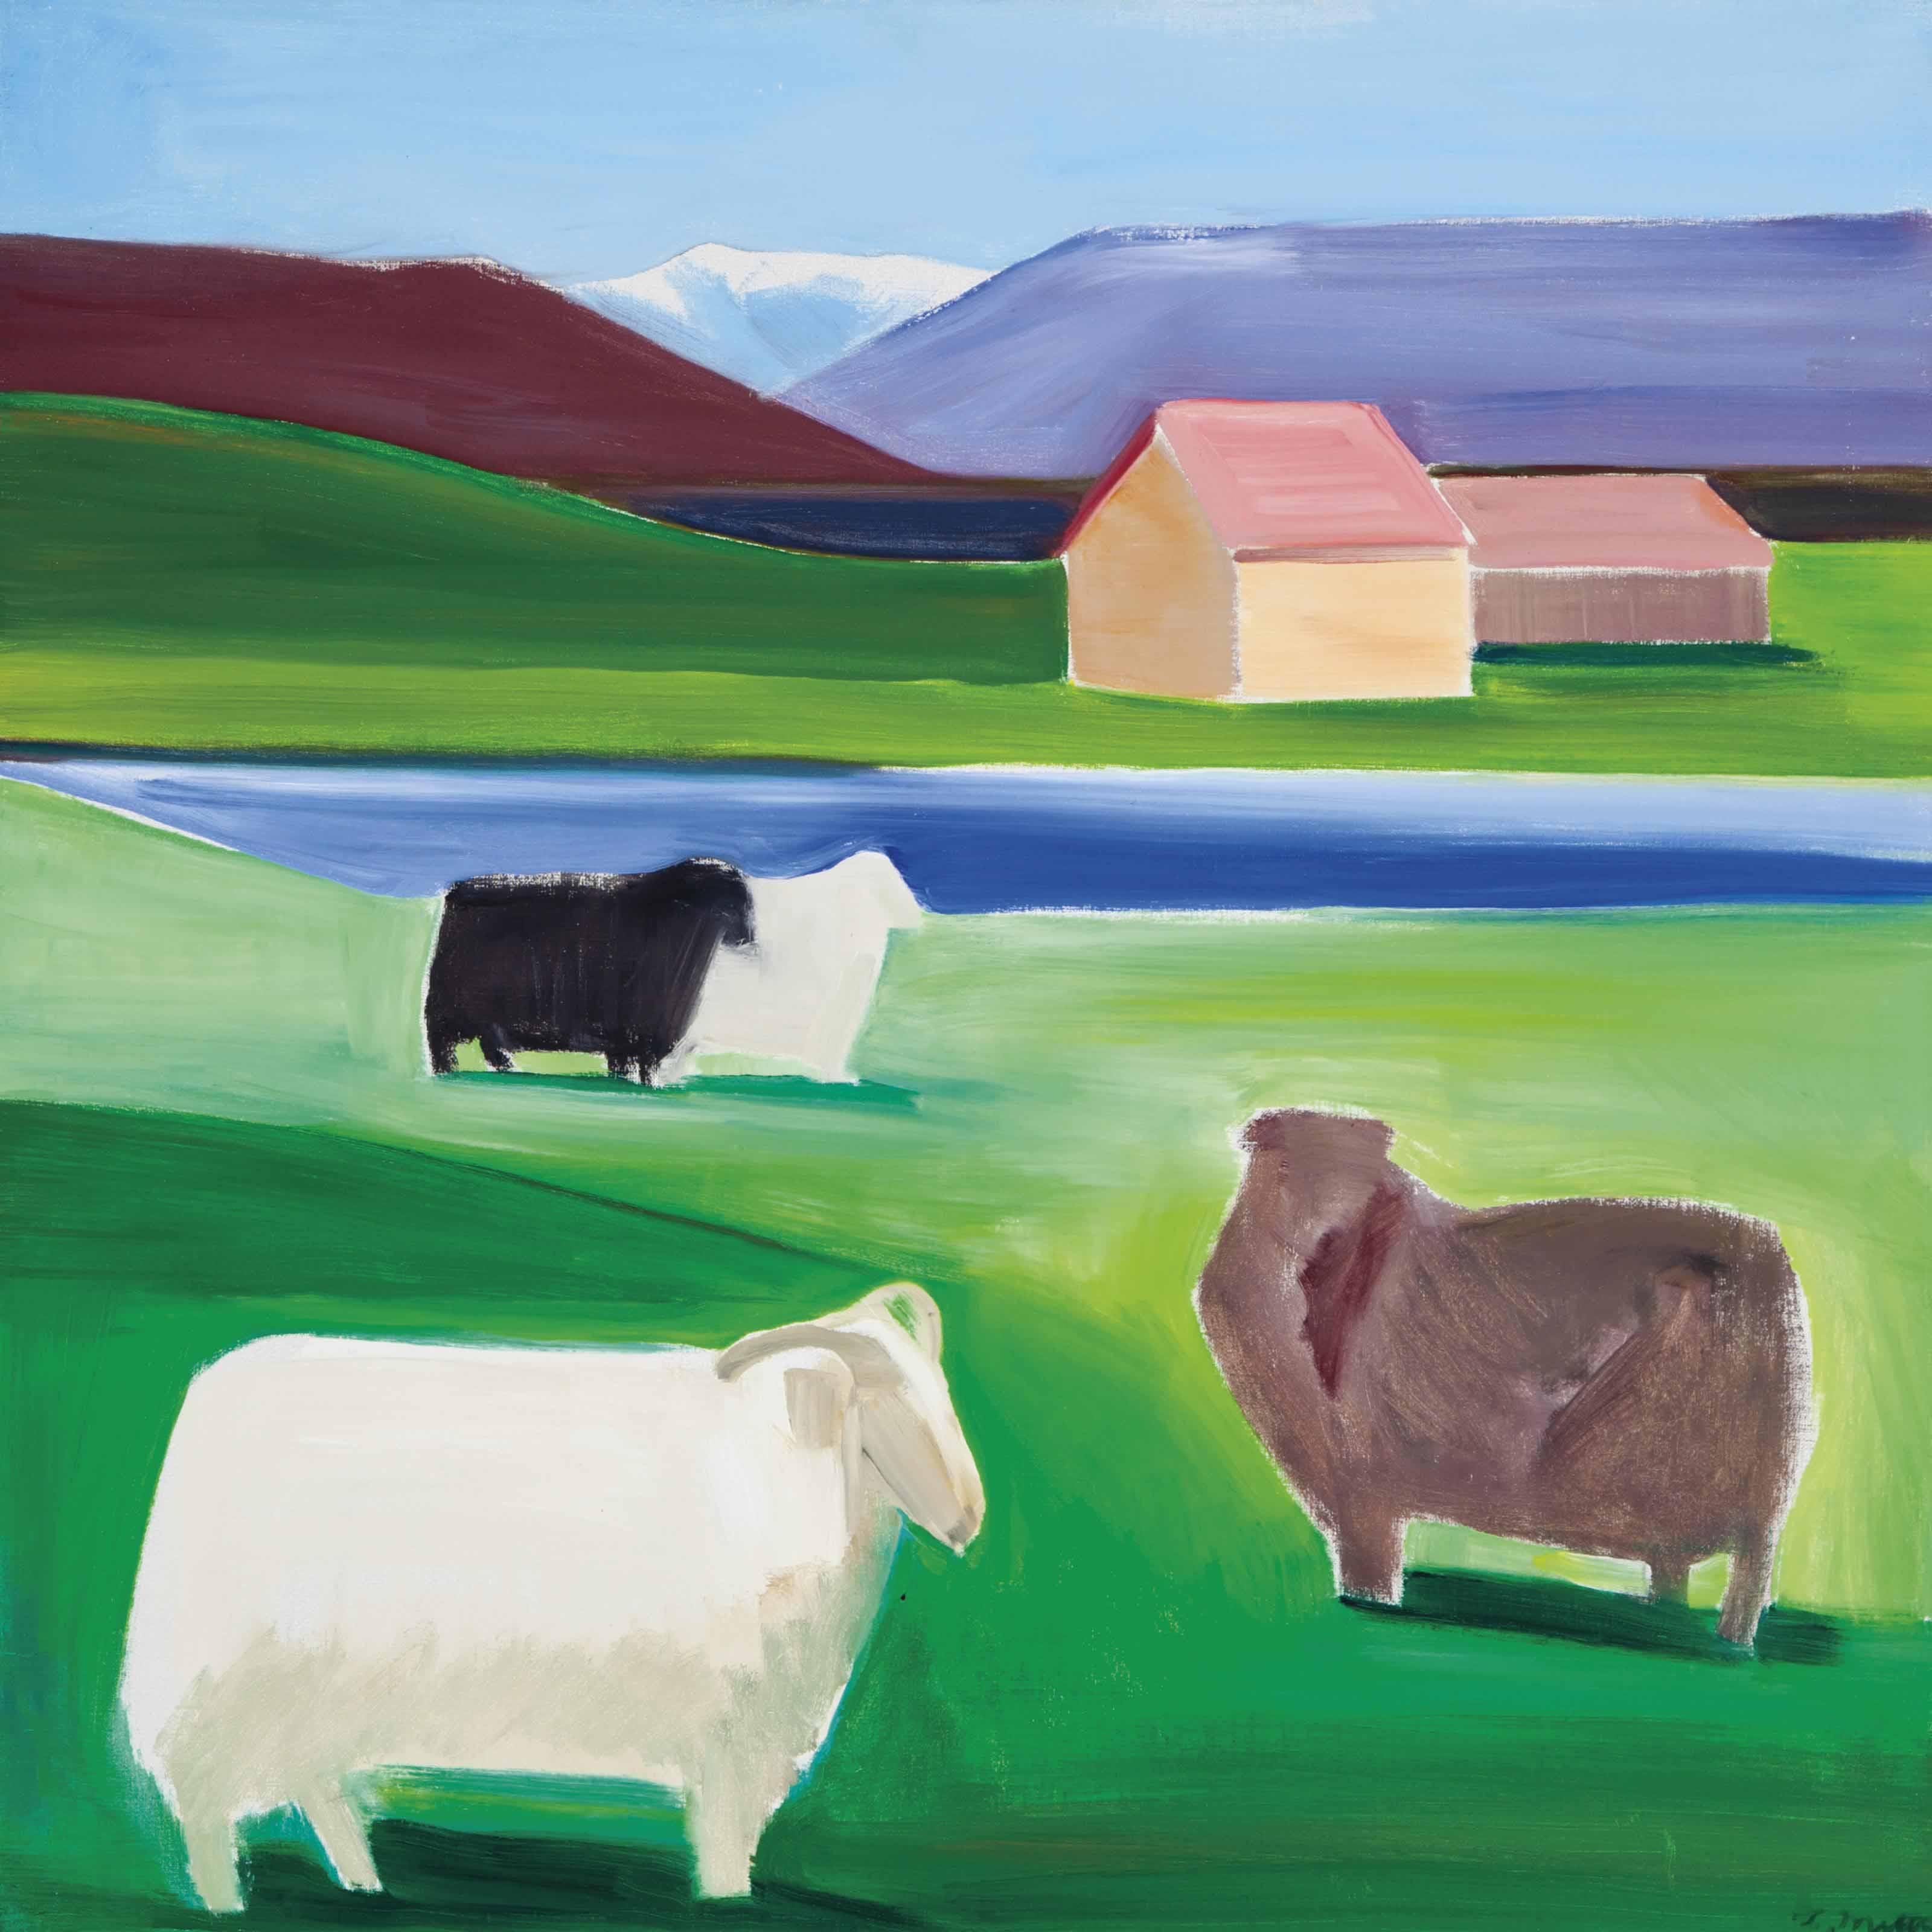 Icelandic landscape with sheep